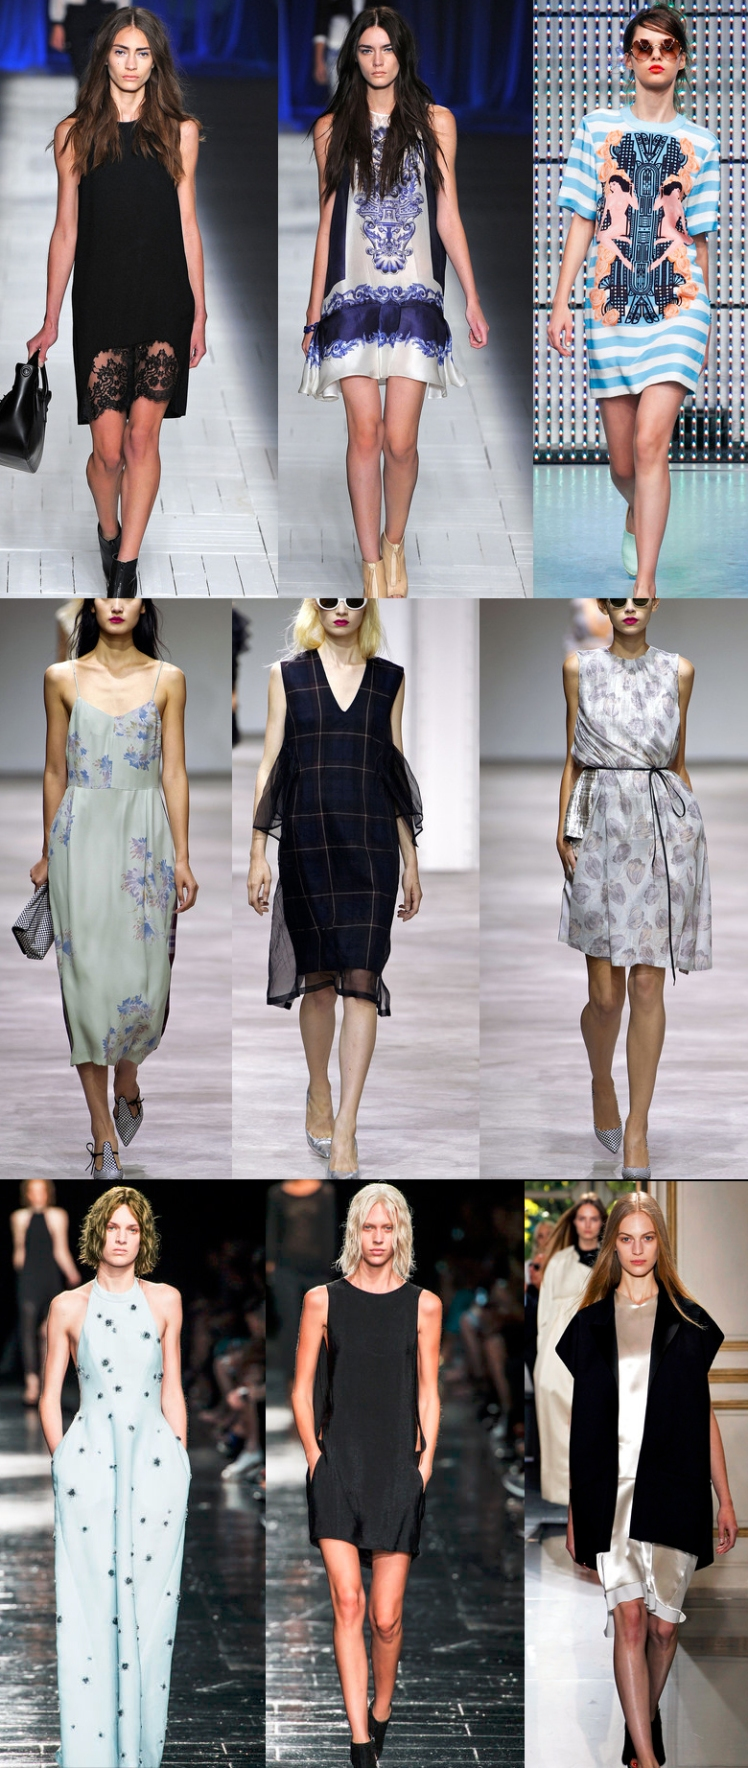 dresses, fashion, style, spring summer 2013, ss13, dries van noten, roberto cavalli, just cavalli, holly fulton, celine, theysken's theory